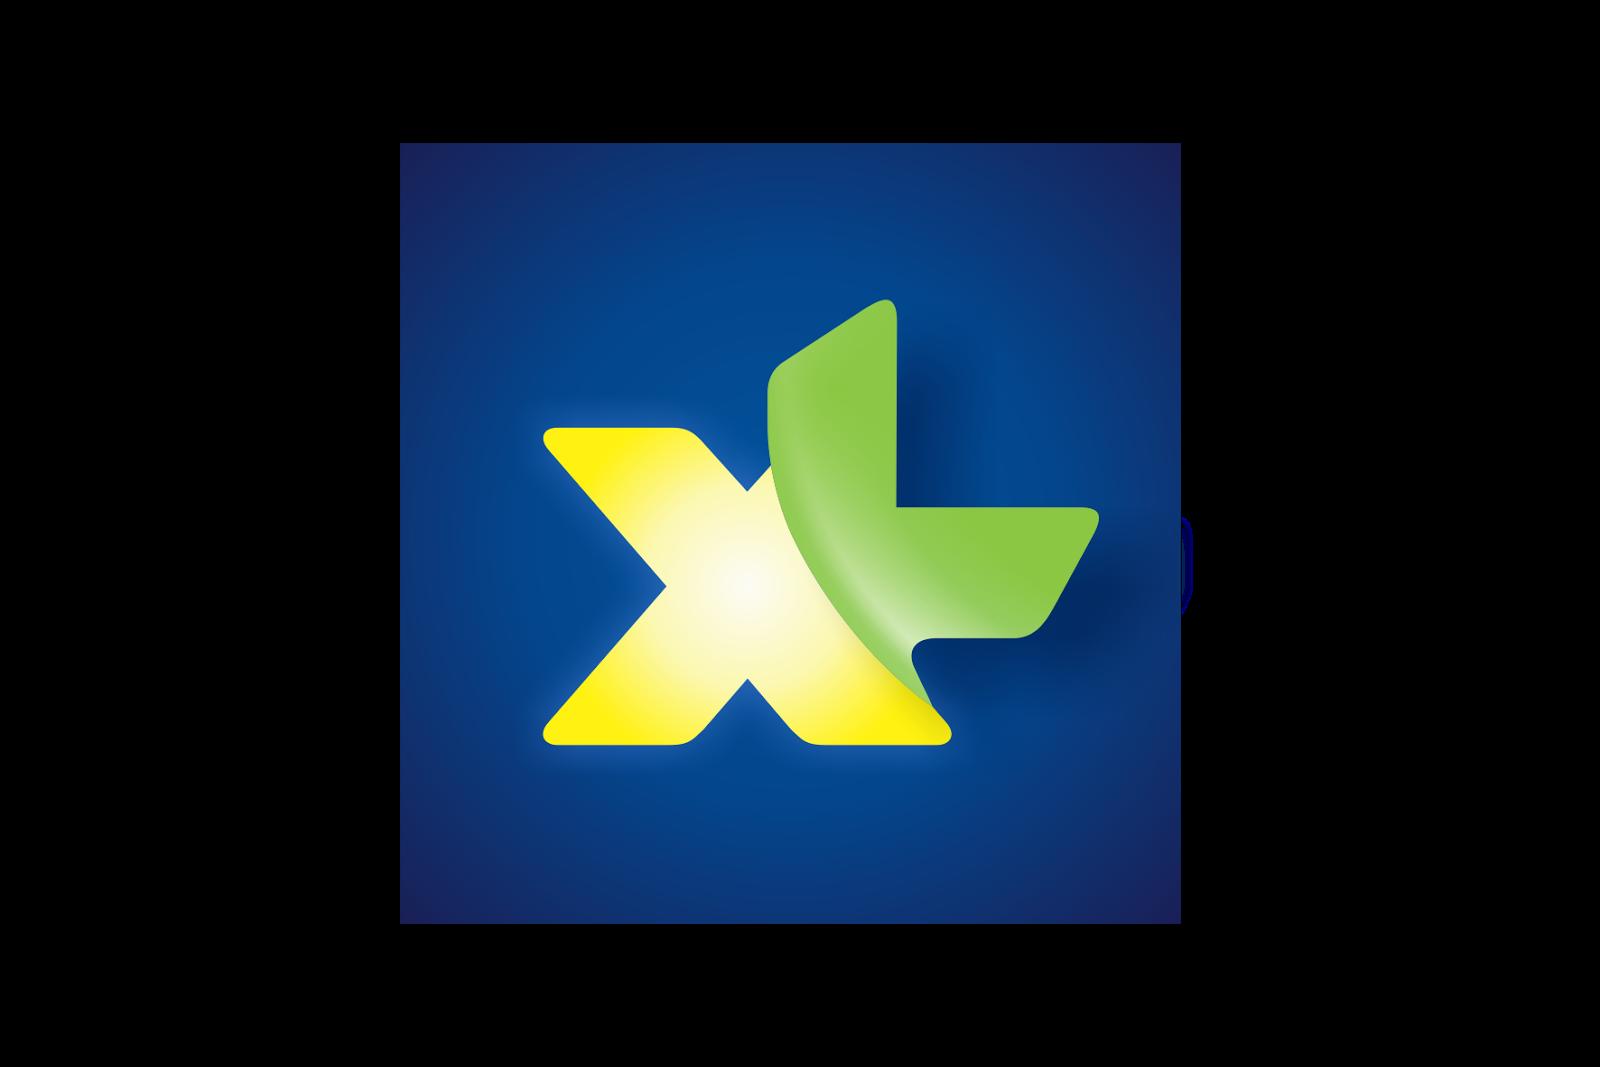 Logo xl baru png 3 » PNG Image.